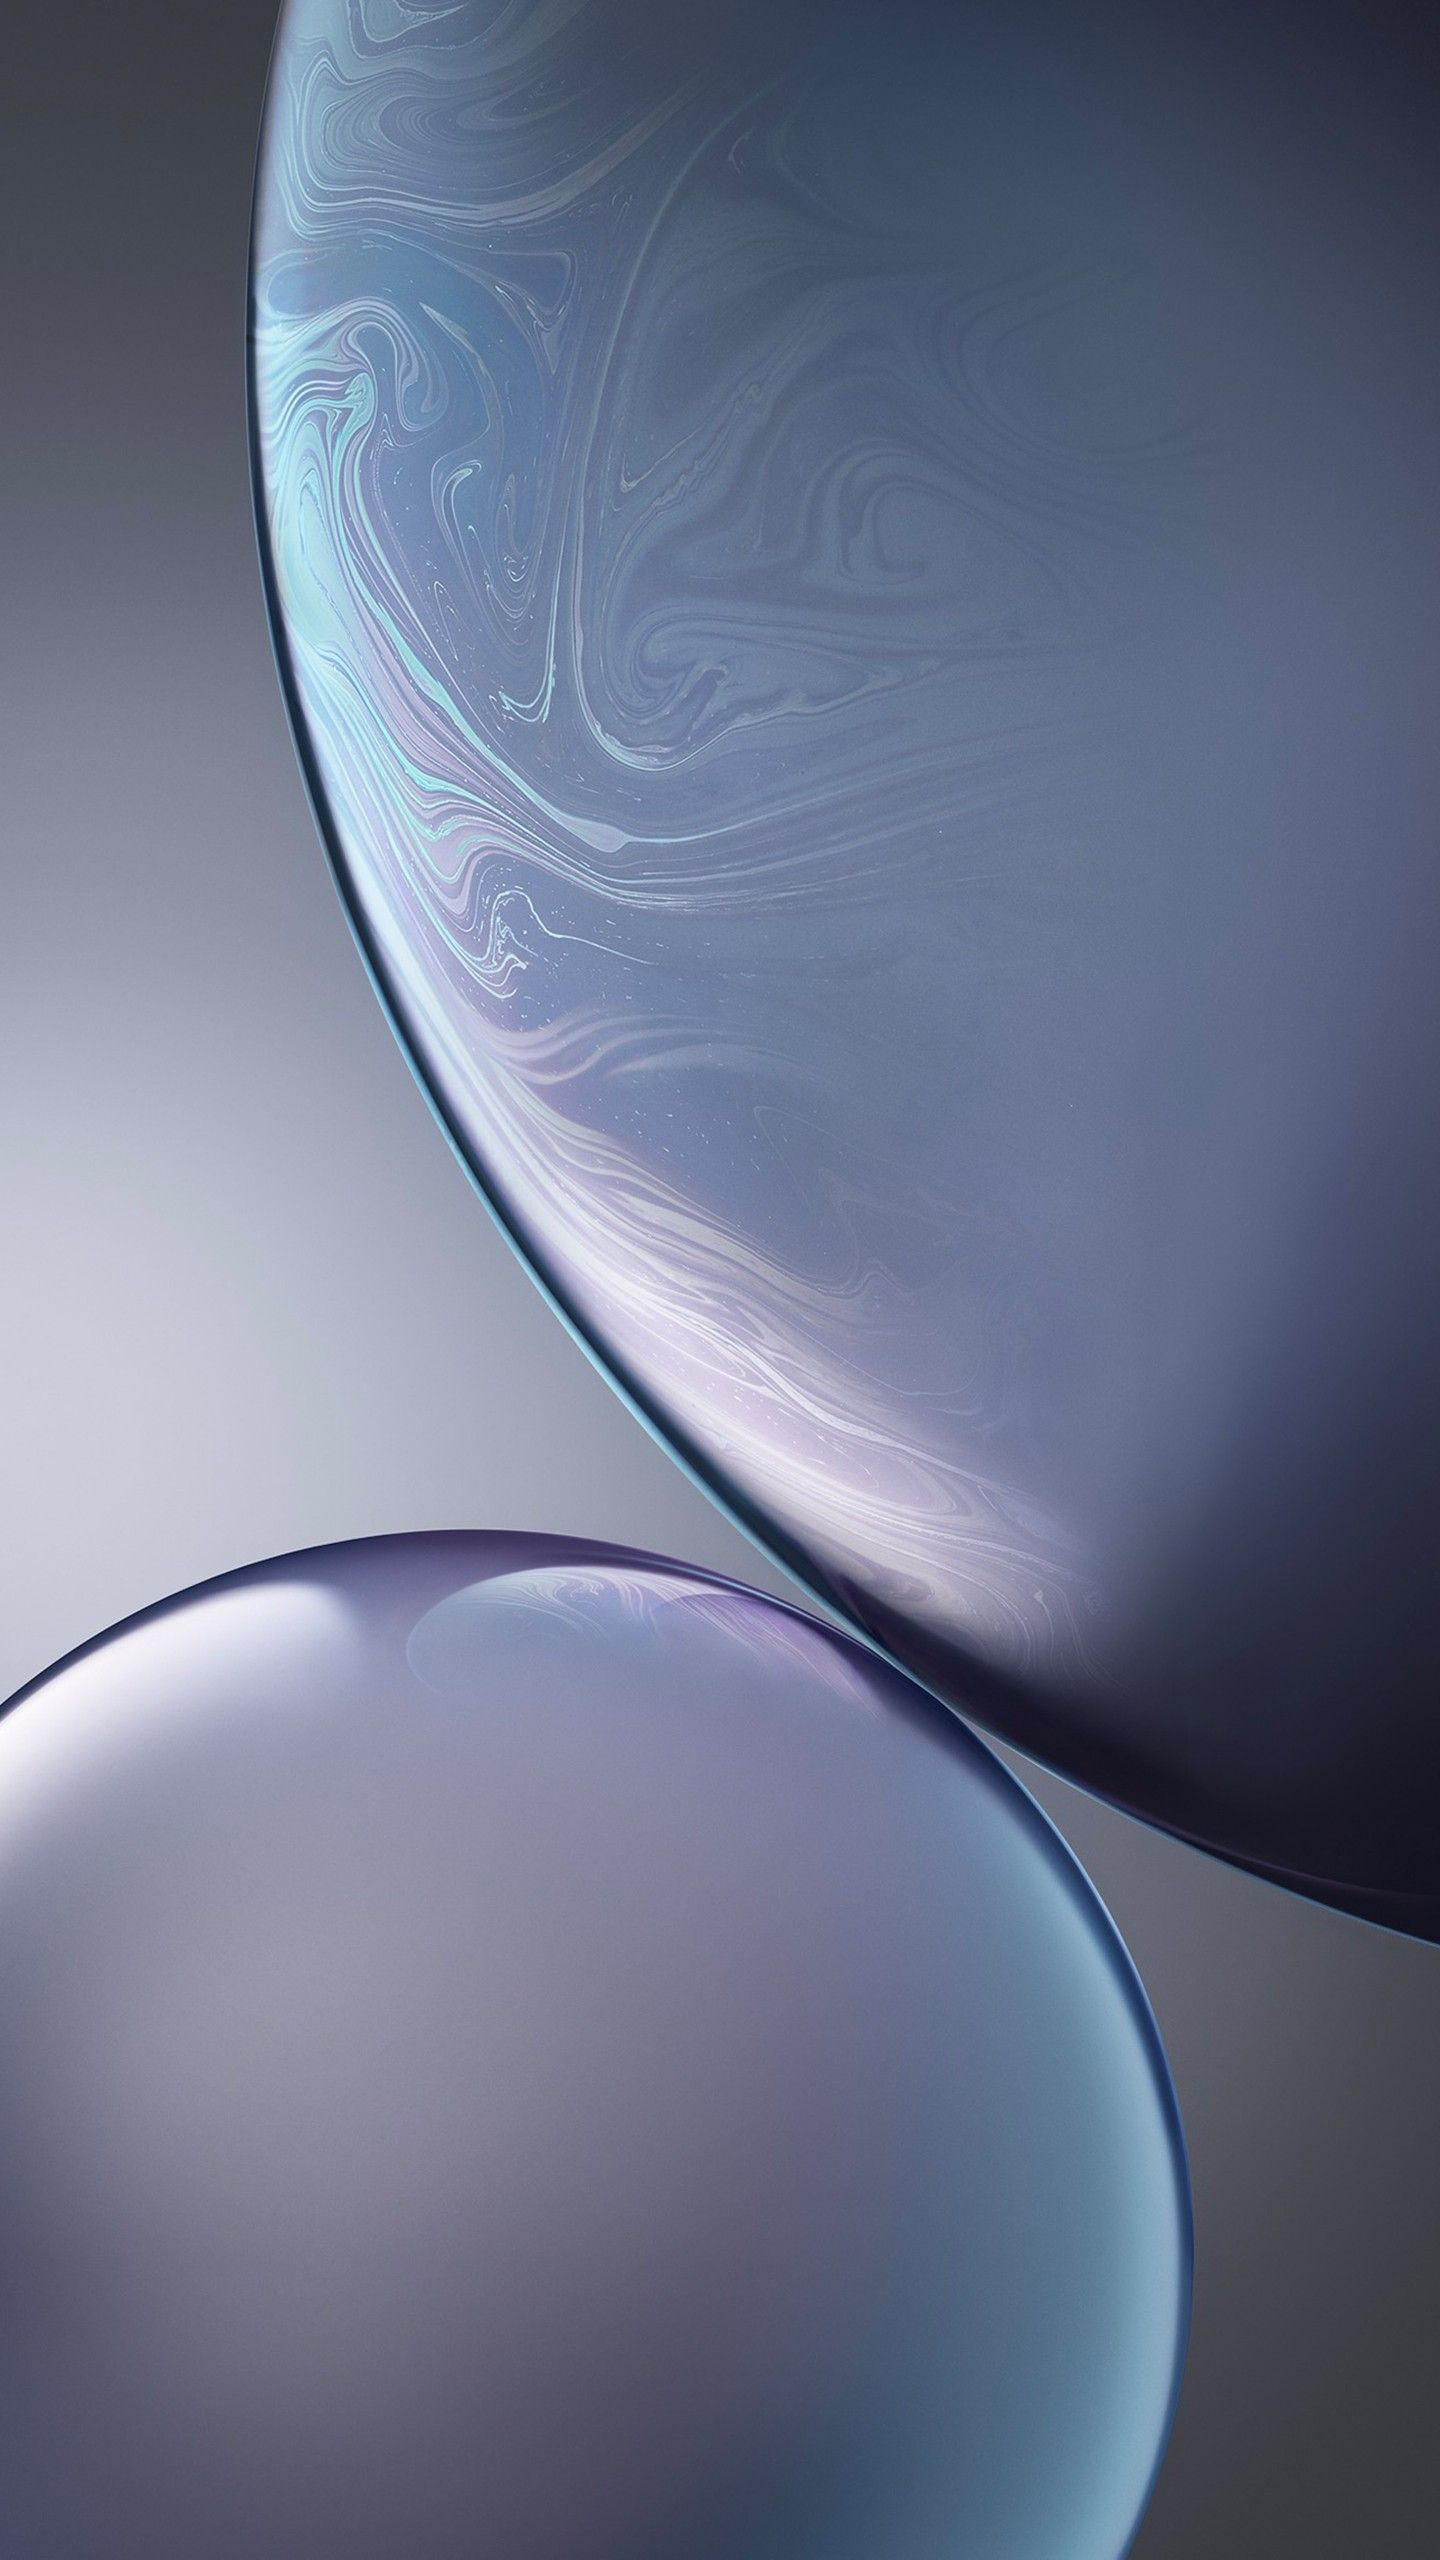 Pin by Hidie Kellogg on W A L L P A P E R ♡ Apple